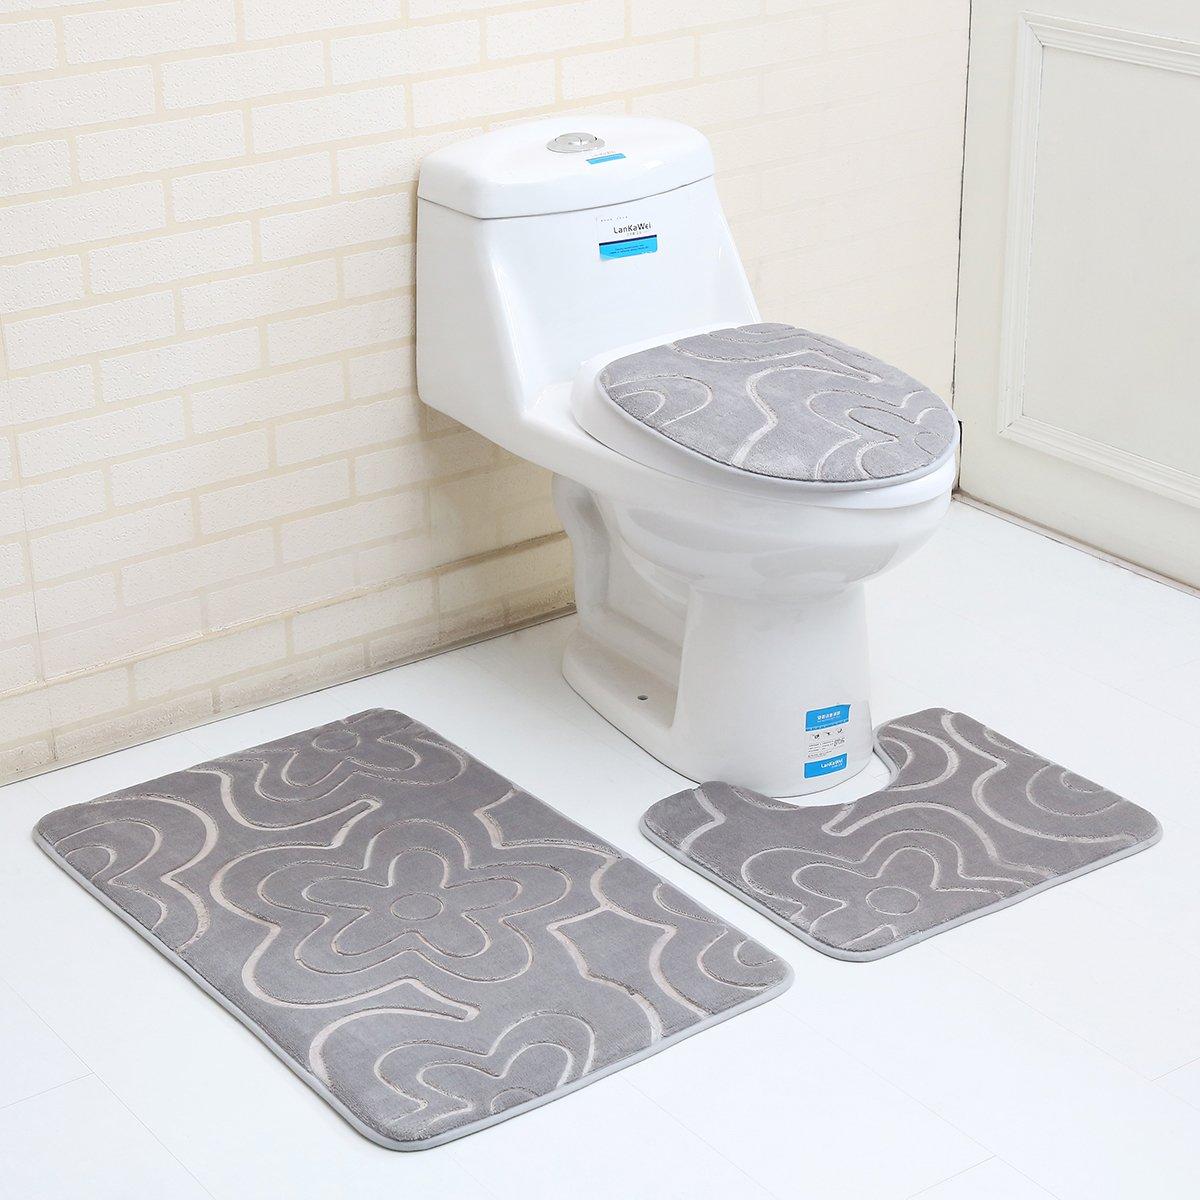 "3PC Bath Mat Rug Set Bathroom Non-Slip Floor Mat Flannel Pedestal Rug(15.7""x19.7"") + Lid Toilet Cover(15.7""x17.7"") + Bath Mat Makaor (19.7""x31.4"") (gray)"